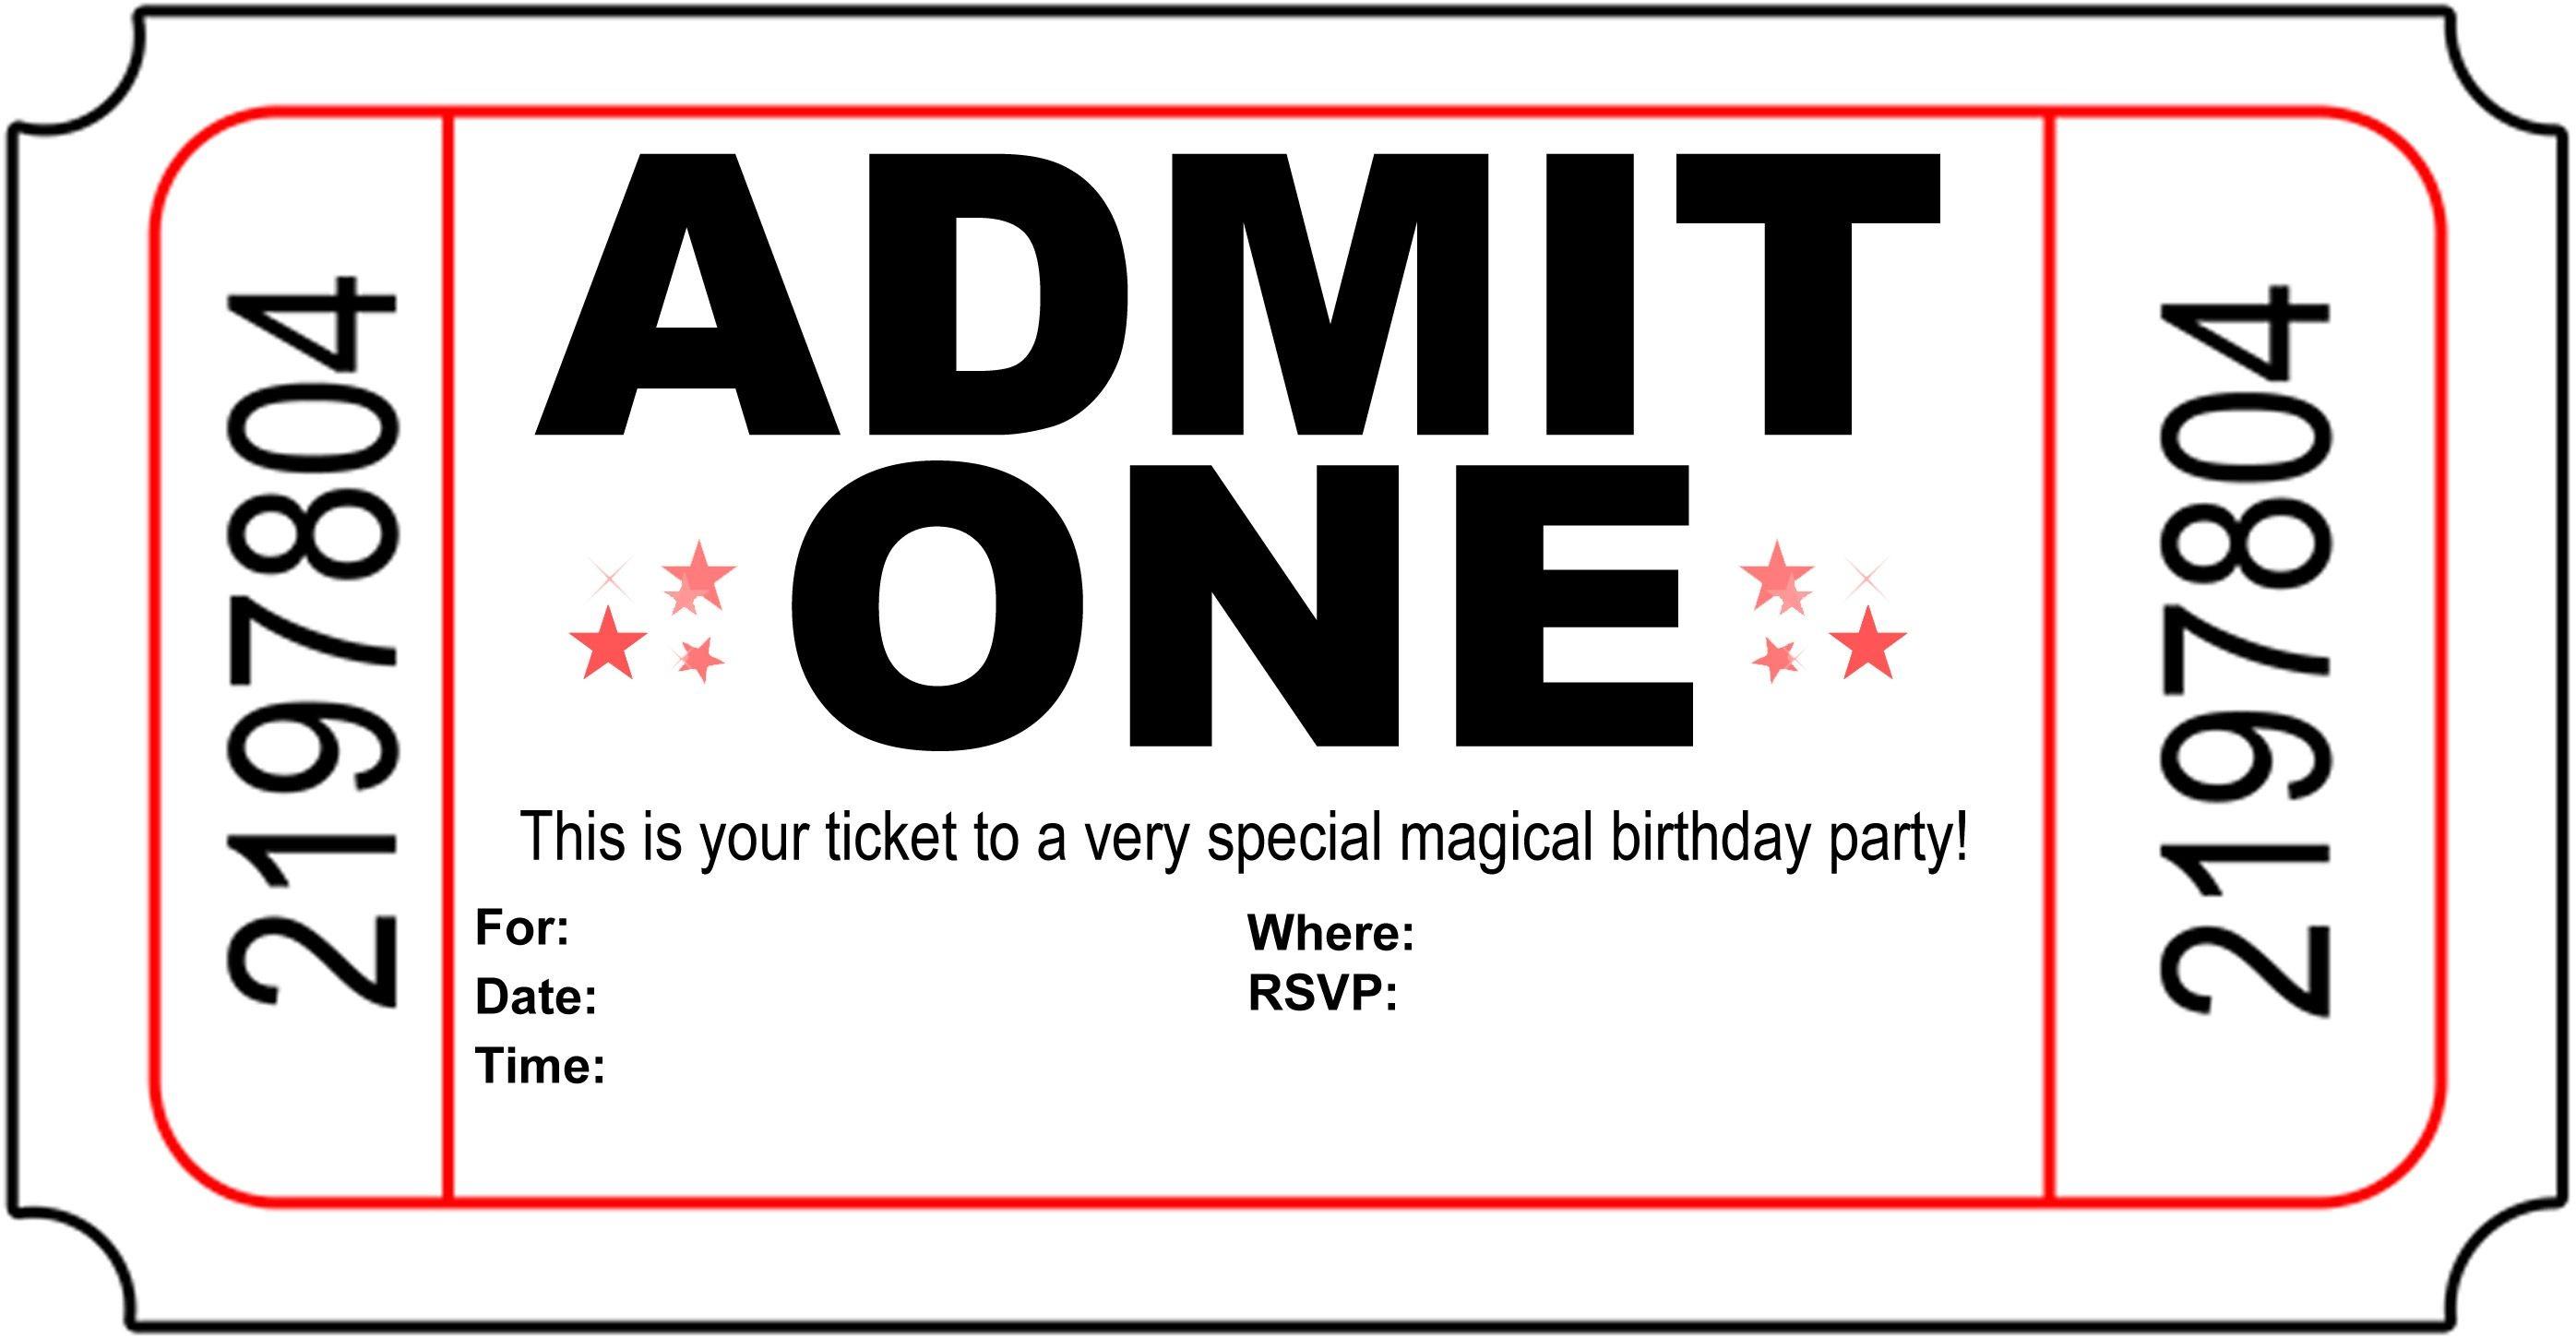 Free Printable Birthday Party Invitations - Kansas Magician | Magic - Free Printable Movie Ticket Birthday Party Invitations